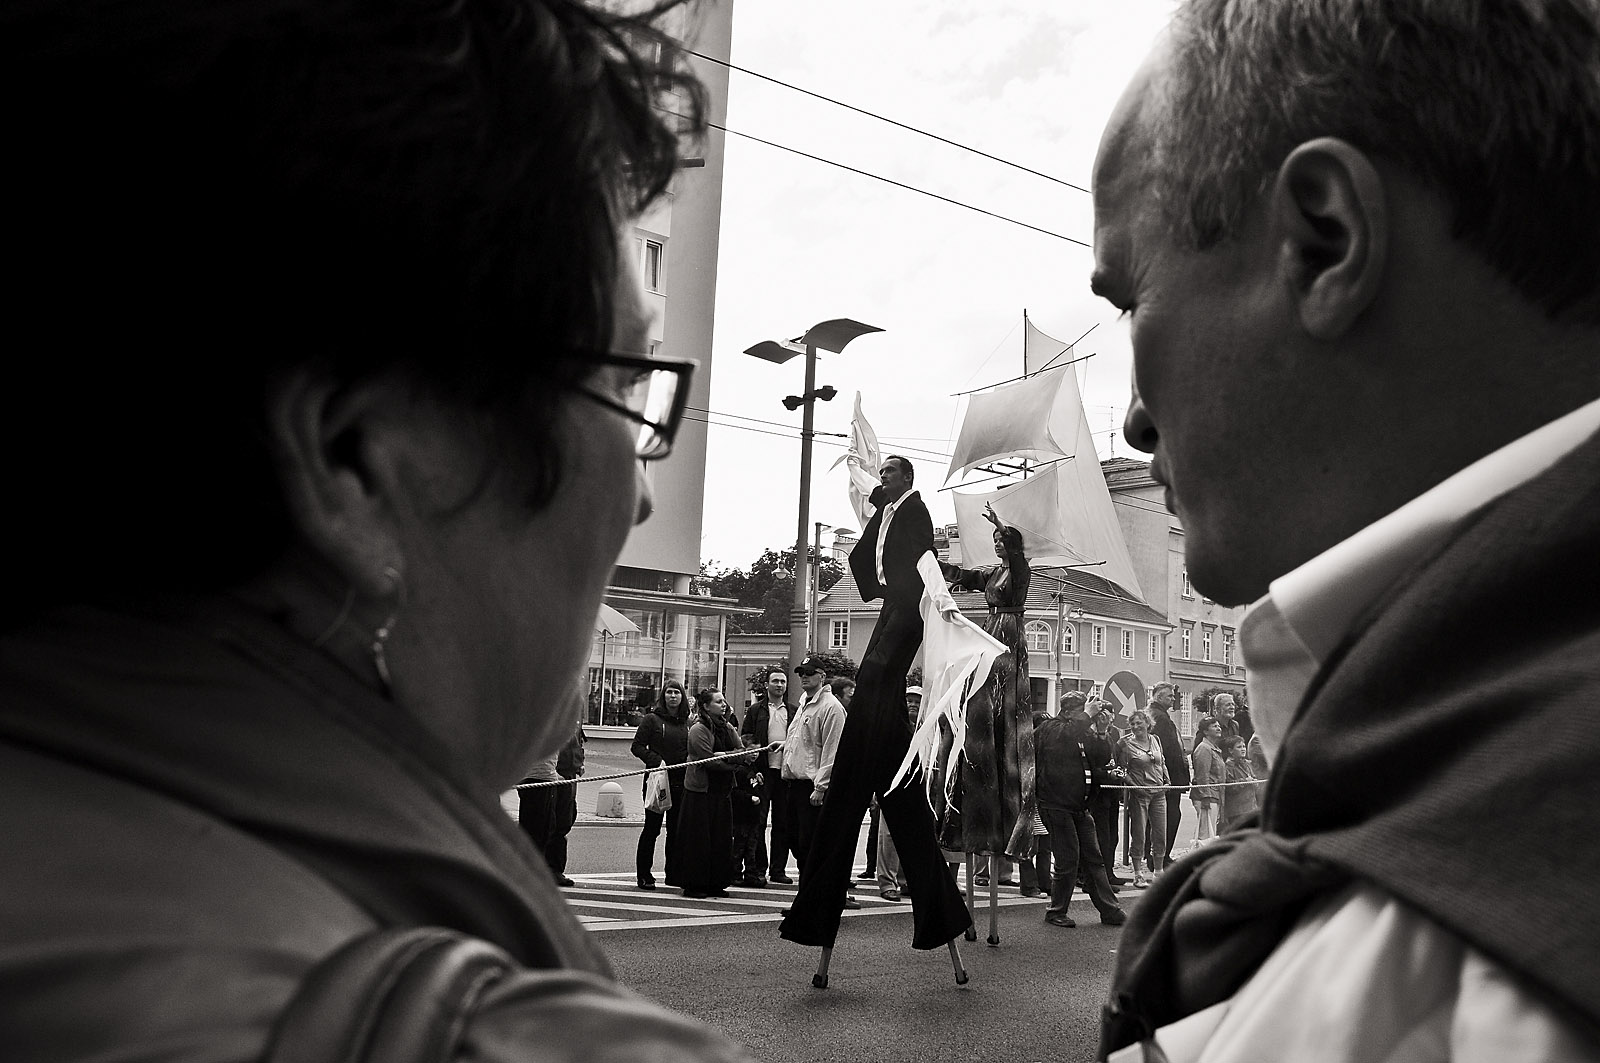 Gdynia 2009 - Part II